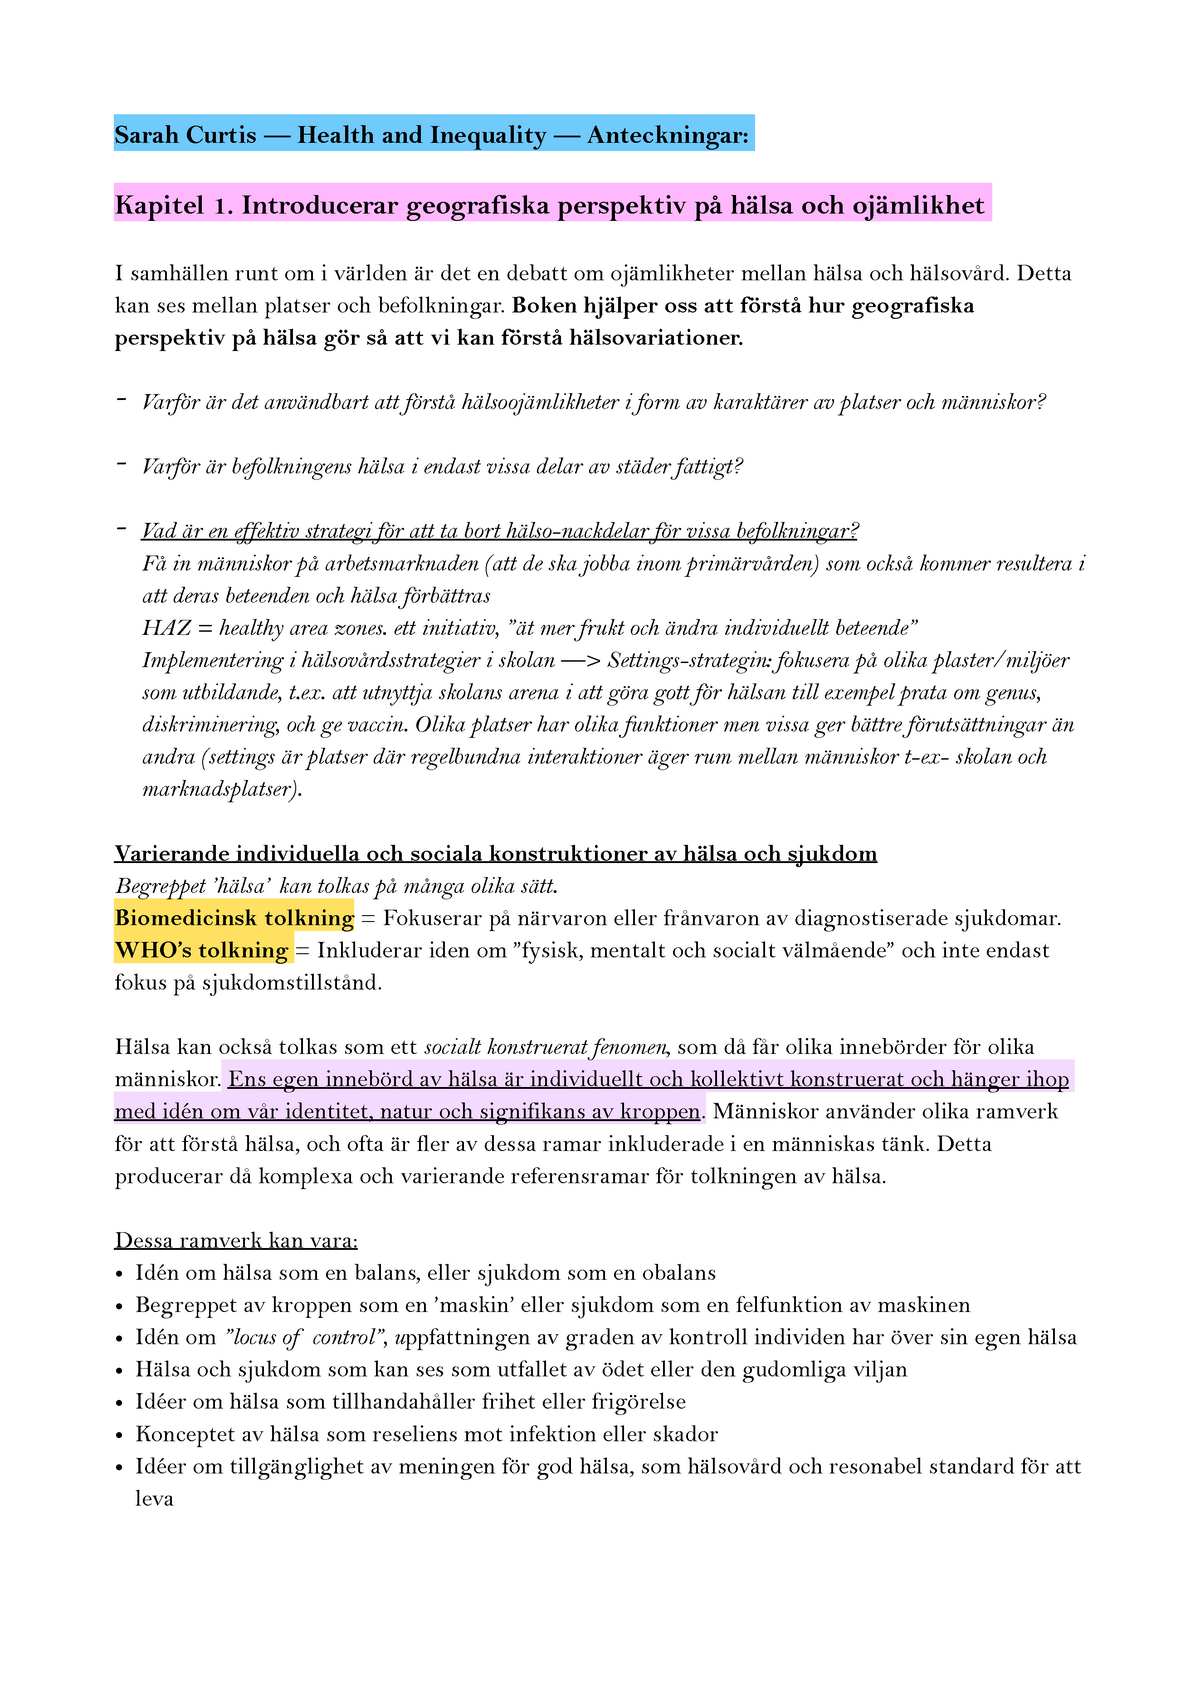 003000a0ce2 Sammanfattning 1572ÖV 1572ÖV 08 Dec 2018 - StuDocu